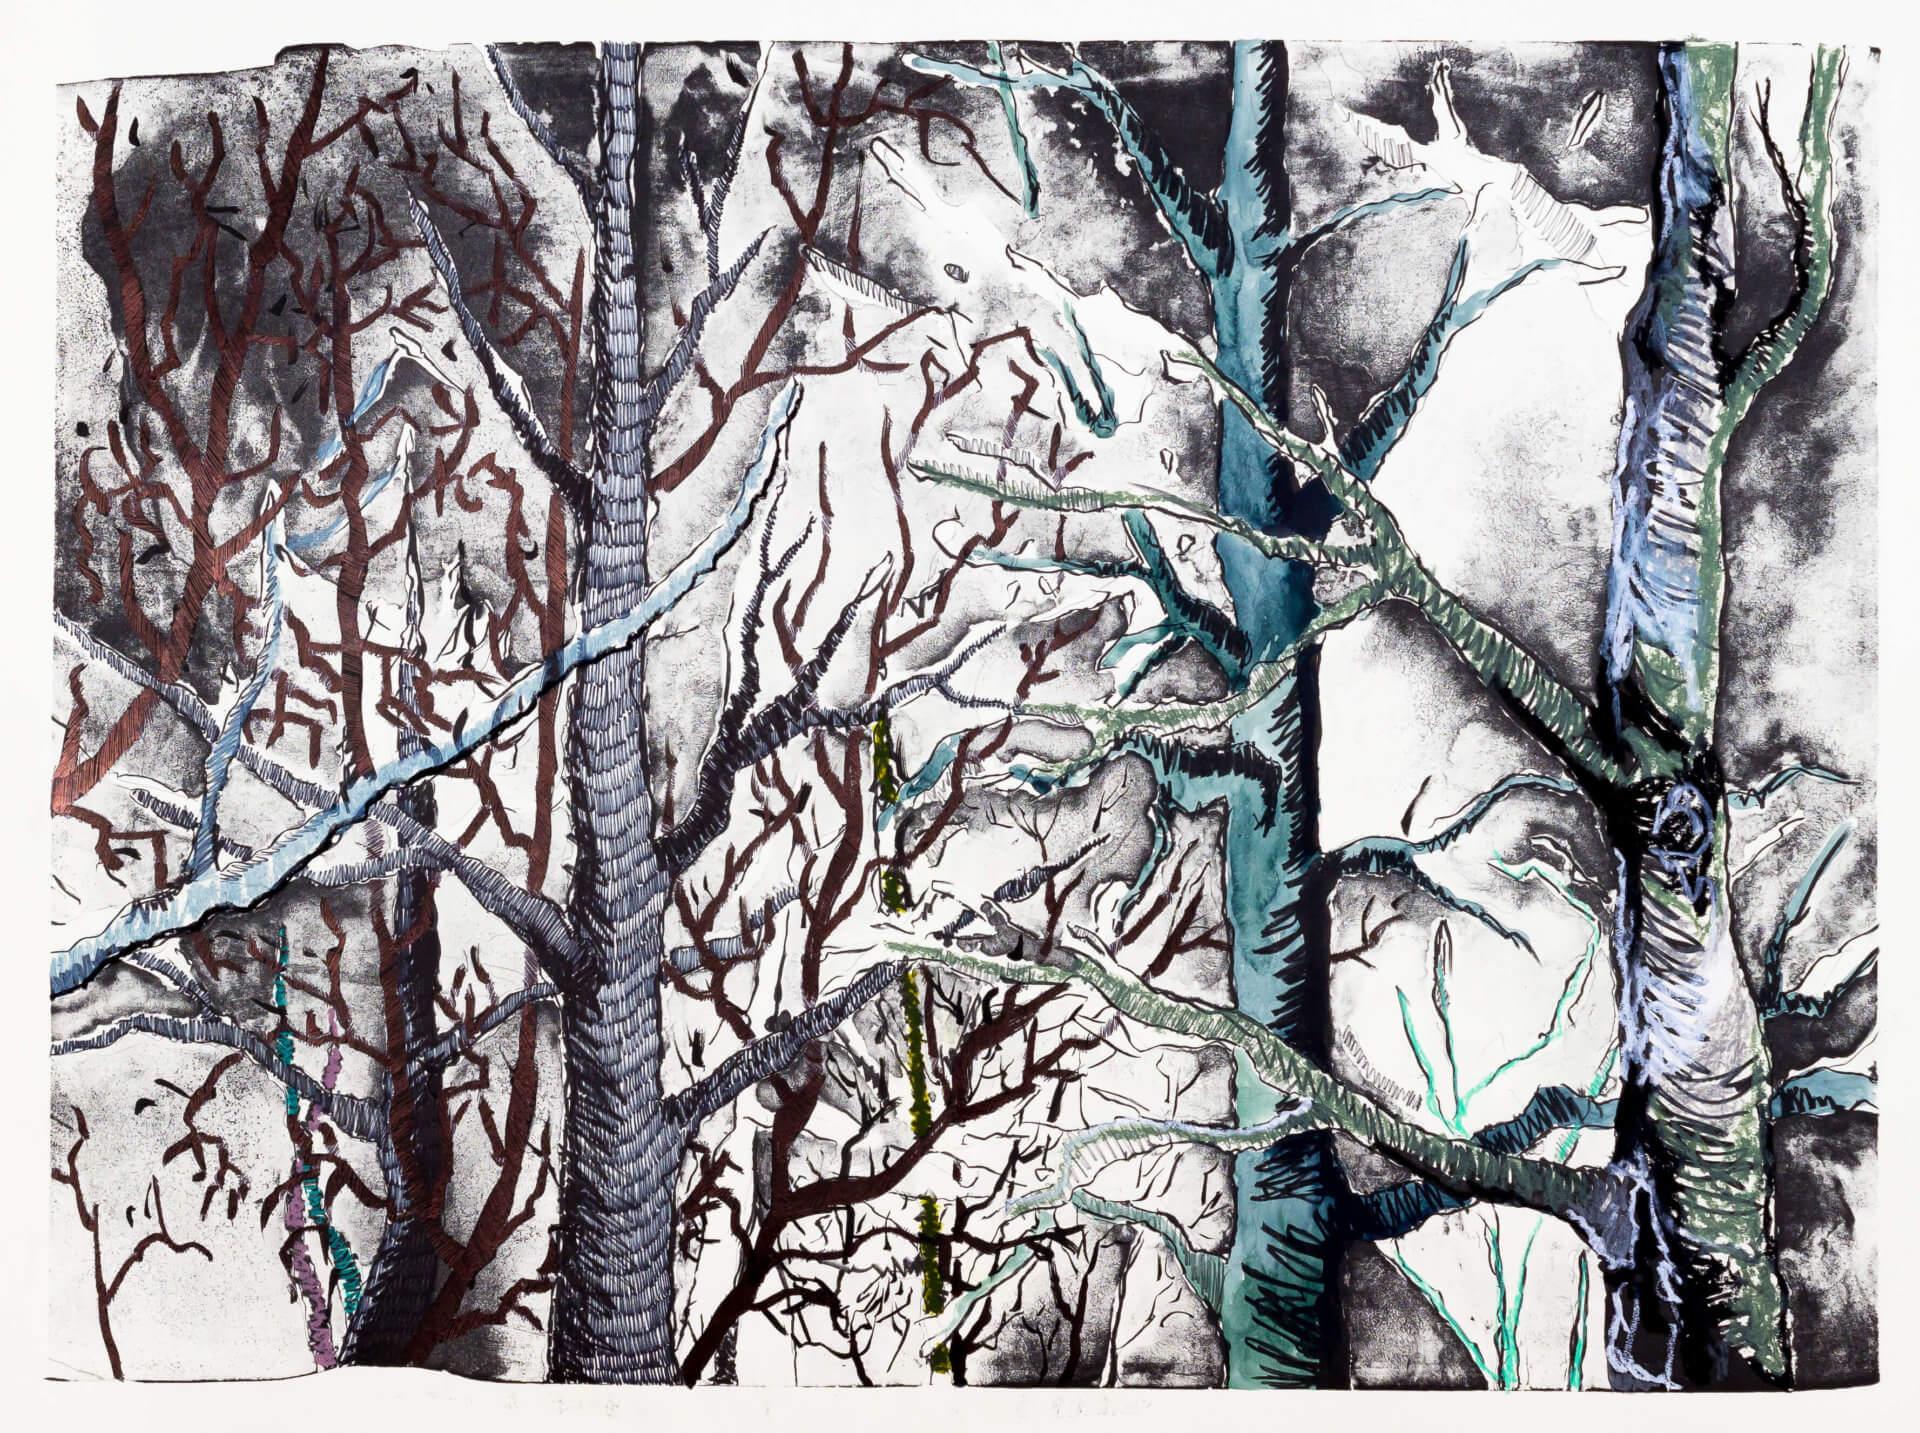 Katharina Albers, Wald (F_B)(F), 2016, Lithographie handkoloriert (Ölkreide, Graphit, Aquarellfarbe, Fineliner, Gelstift, Tusche), Unikat, 70×100 cm